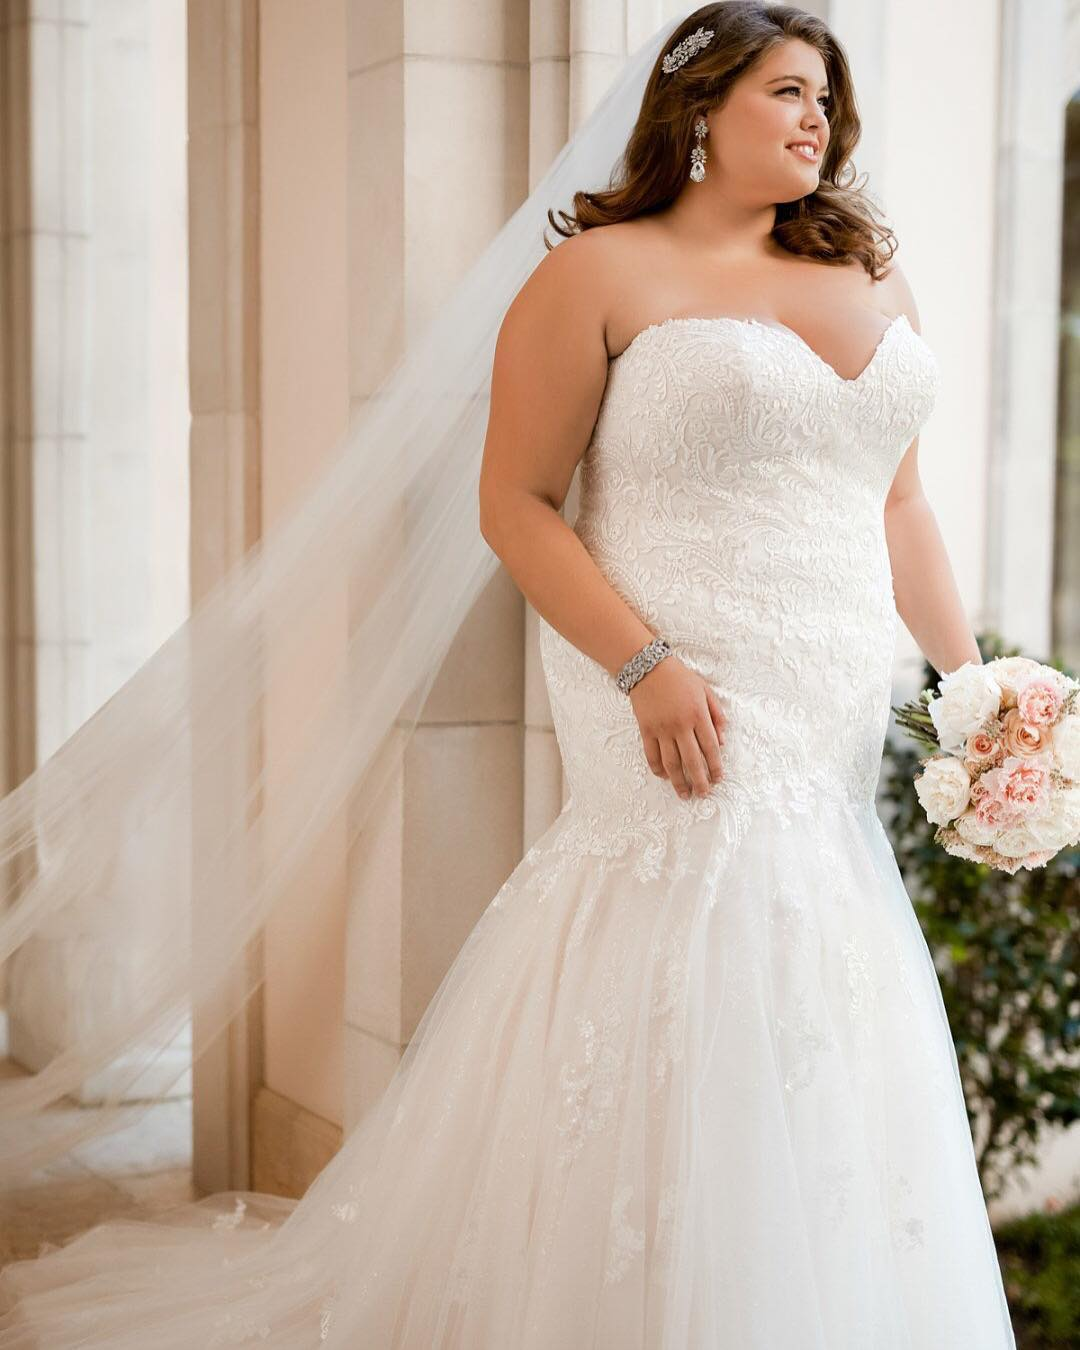 fe06f2579 Vestido de noiva sereia: 100 modelos deslumbrantes para o grande dia